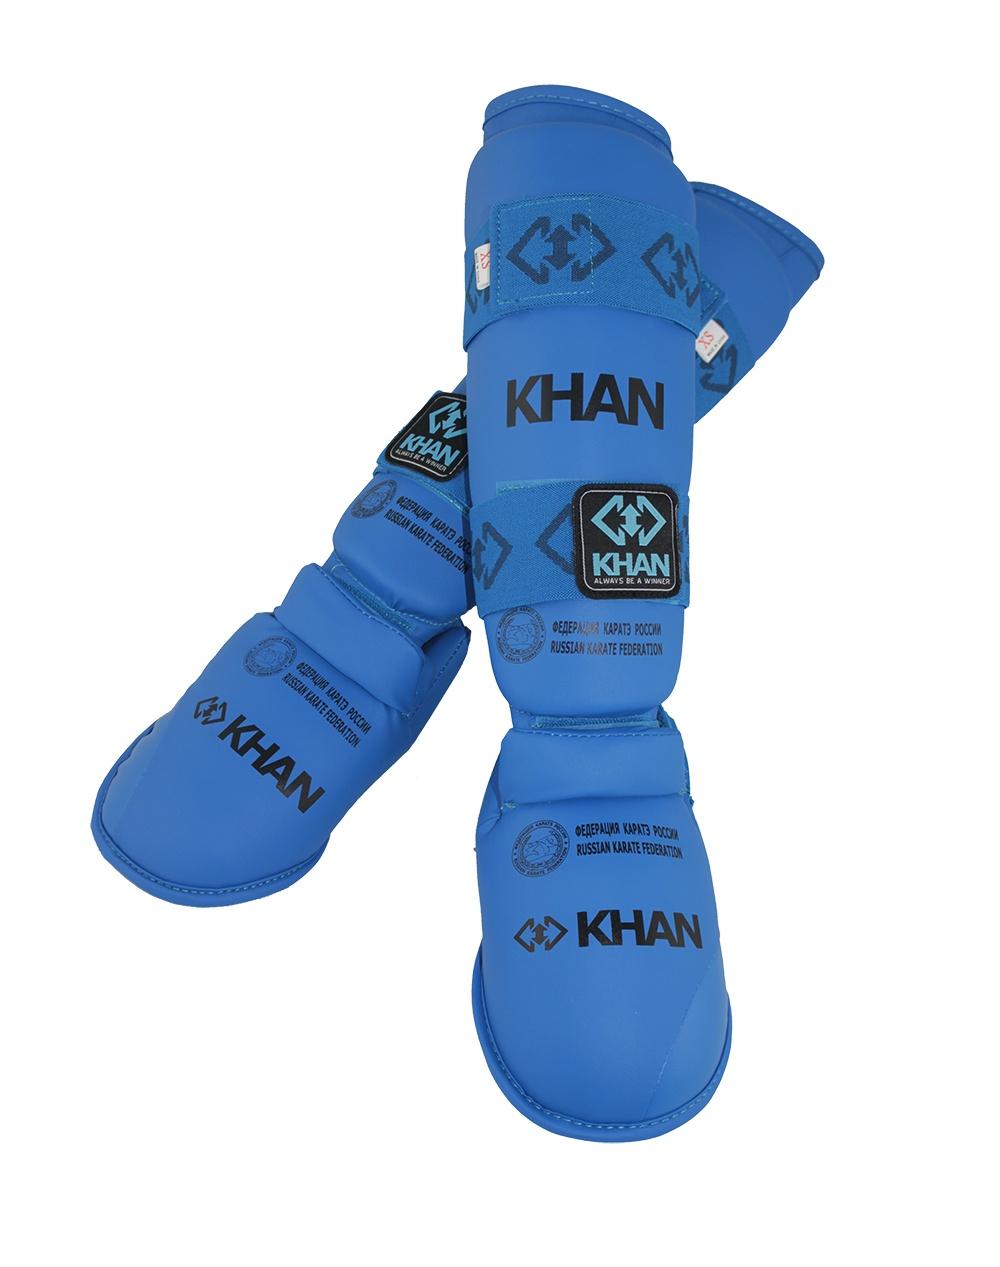 Защита голени и стопы Khan Каратэ ФКР, FKR23001_6, синий, размер S форма для карате khan classic kumite фкр fkr3000 цвет белый размер 110